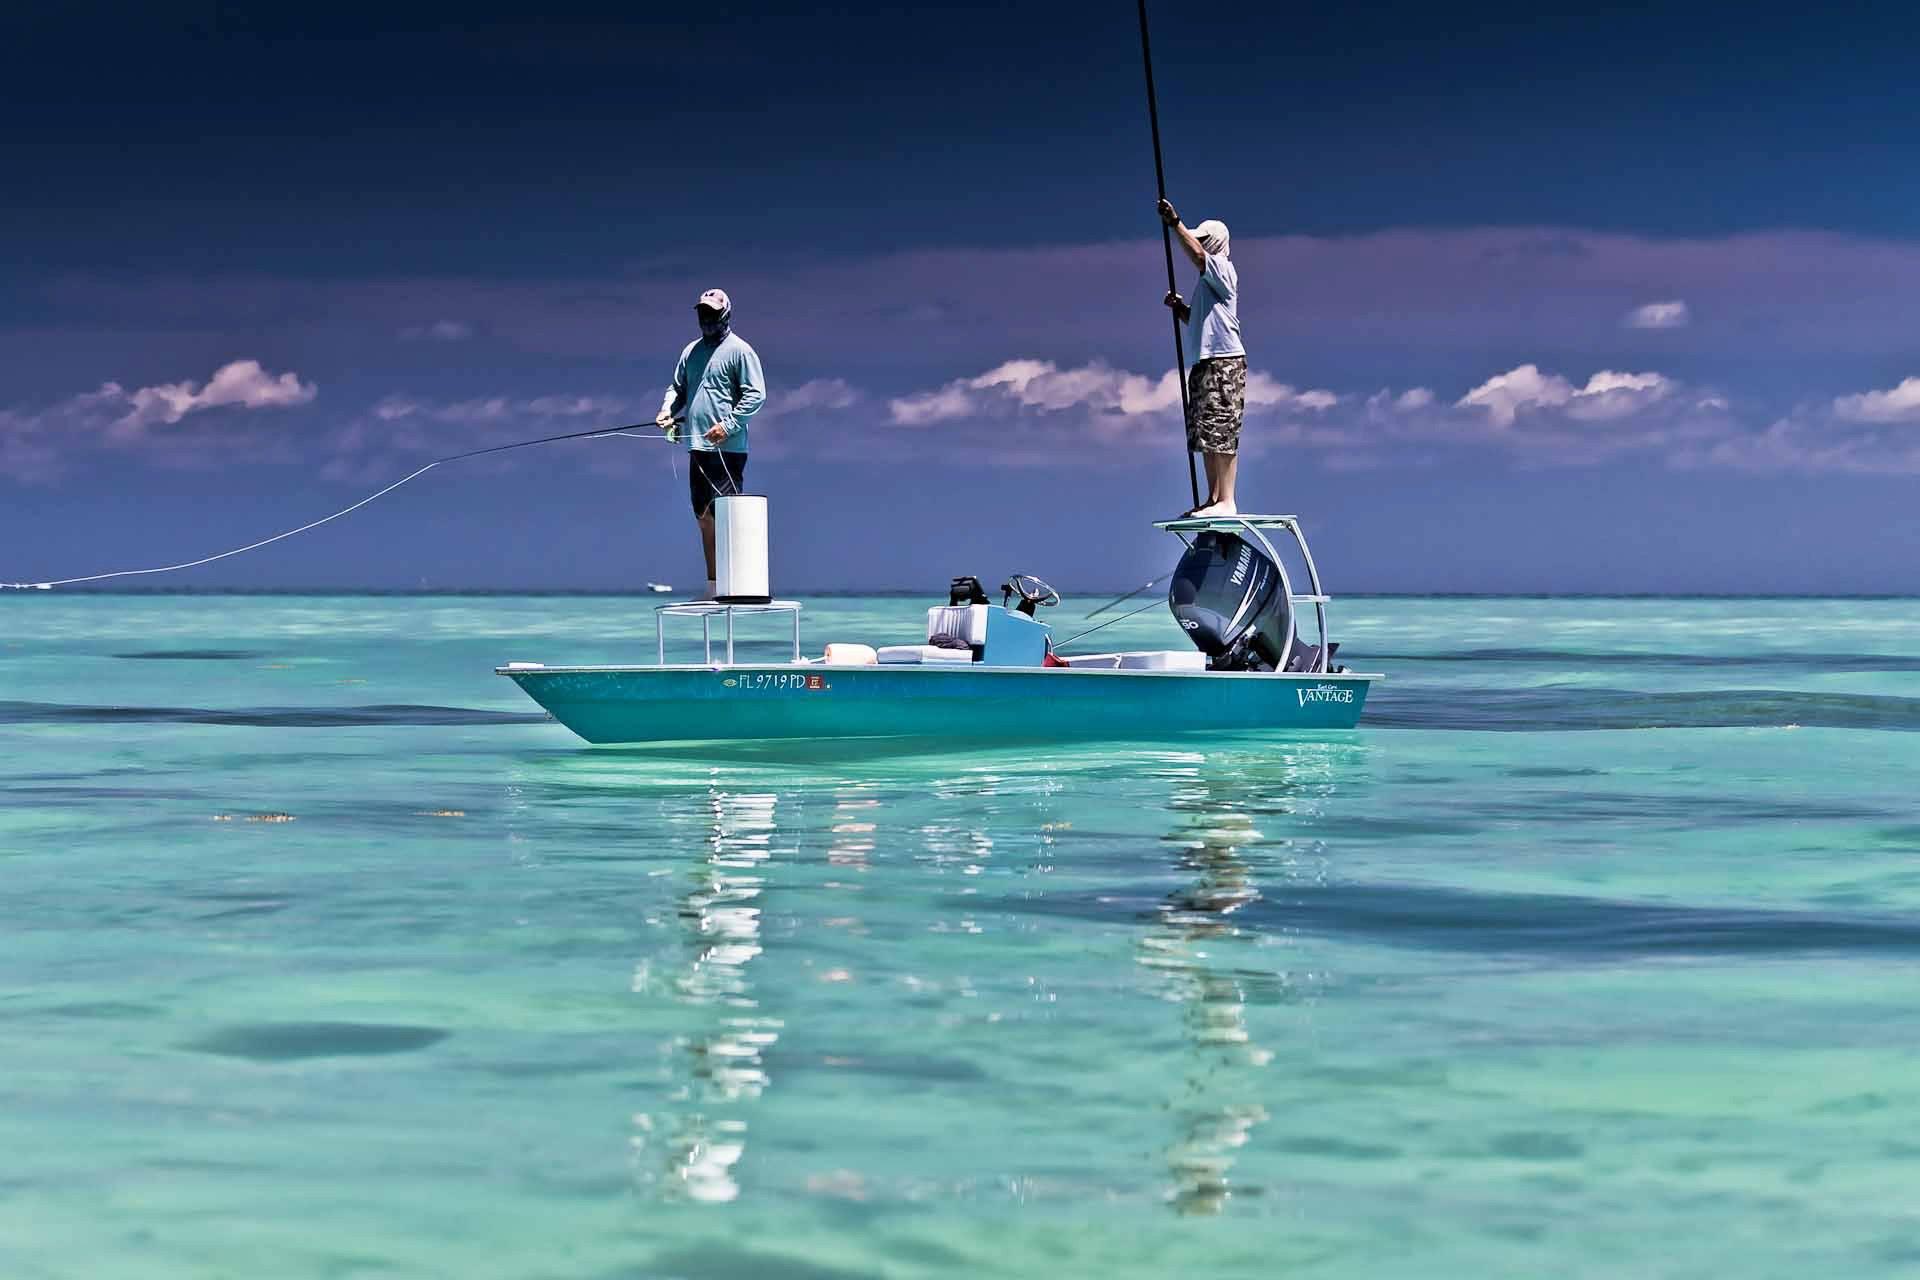 The florida keys east cape skiffs style skiff life for Best fishing in florida keys